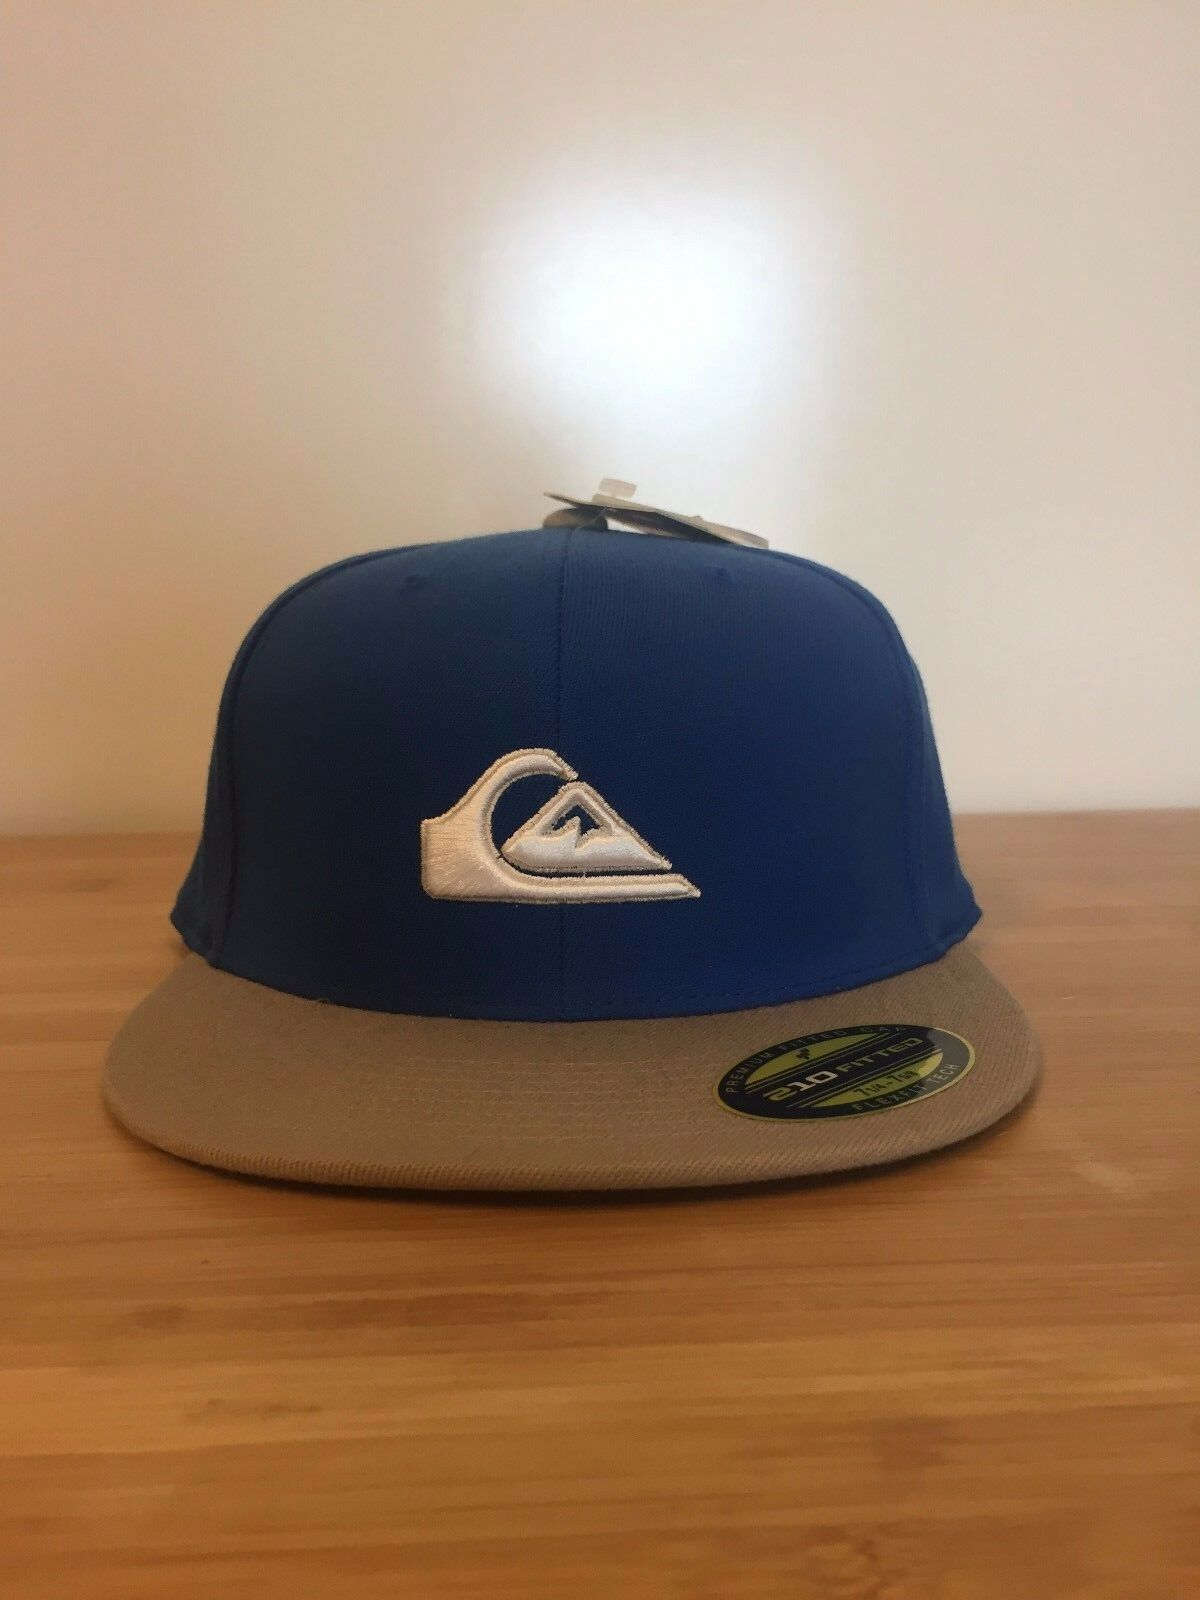 New Blue/Tan Quicksilver Premium Fitted Flat Hat Brim Cap Flexfit Tech Hat Flat 1ed29d